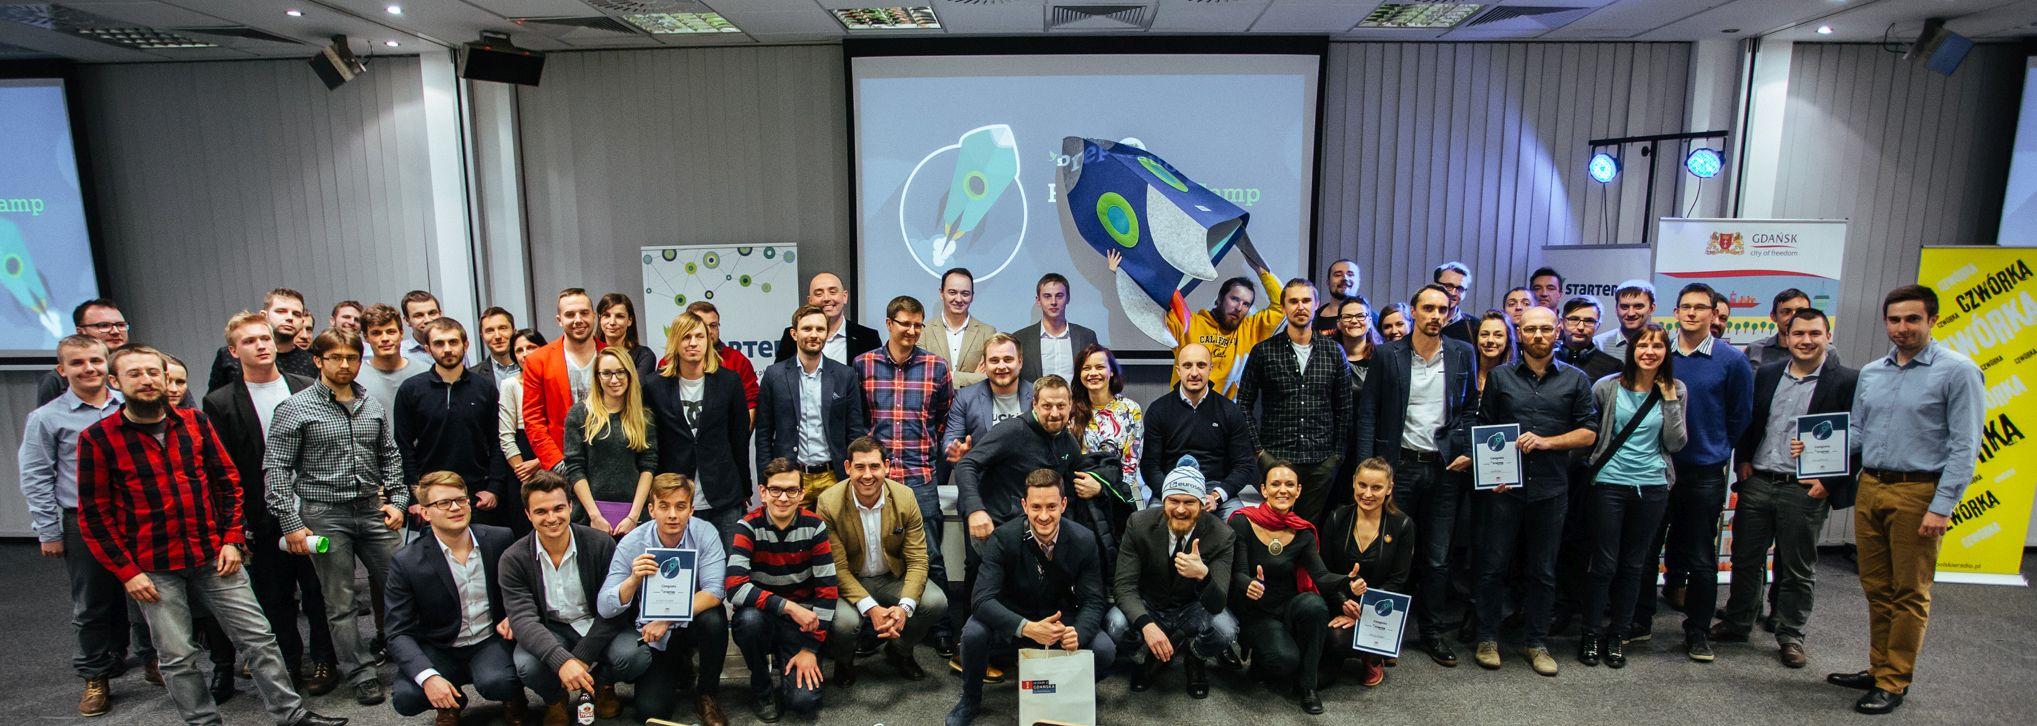 Starter Rocket PreparationCamp_fot. Michał Skotarczak